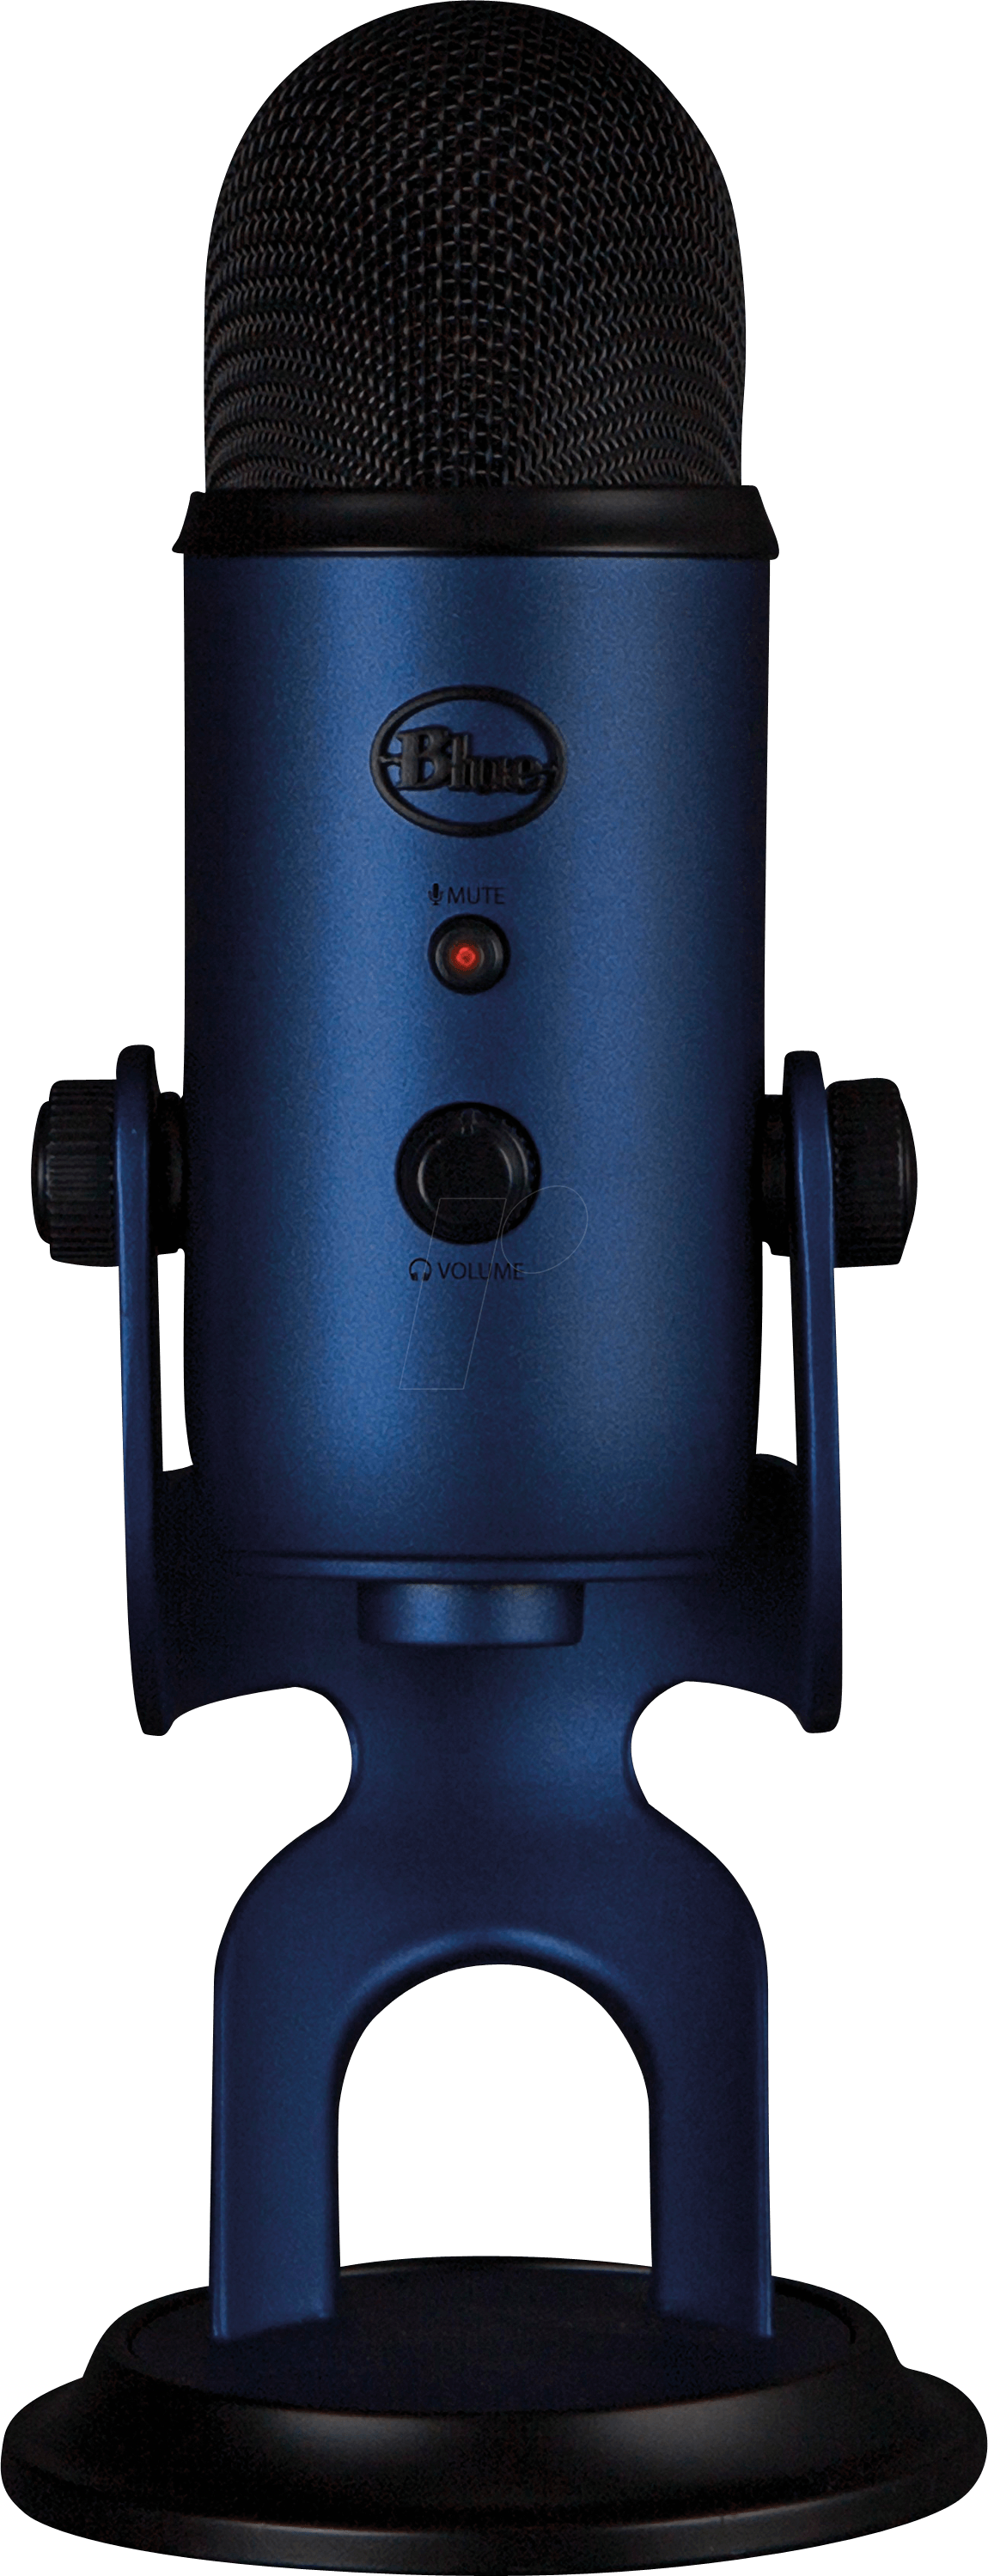 BLUE MICRO 2117 - Midnight Blue Yeti USB microphone